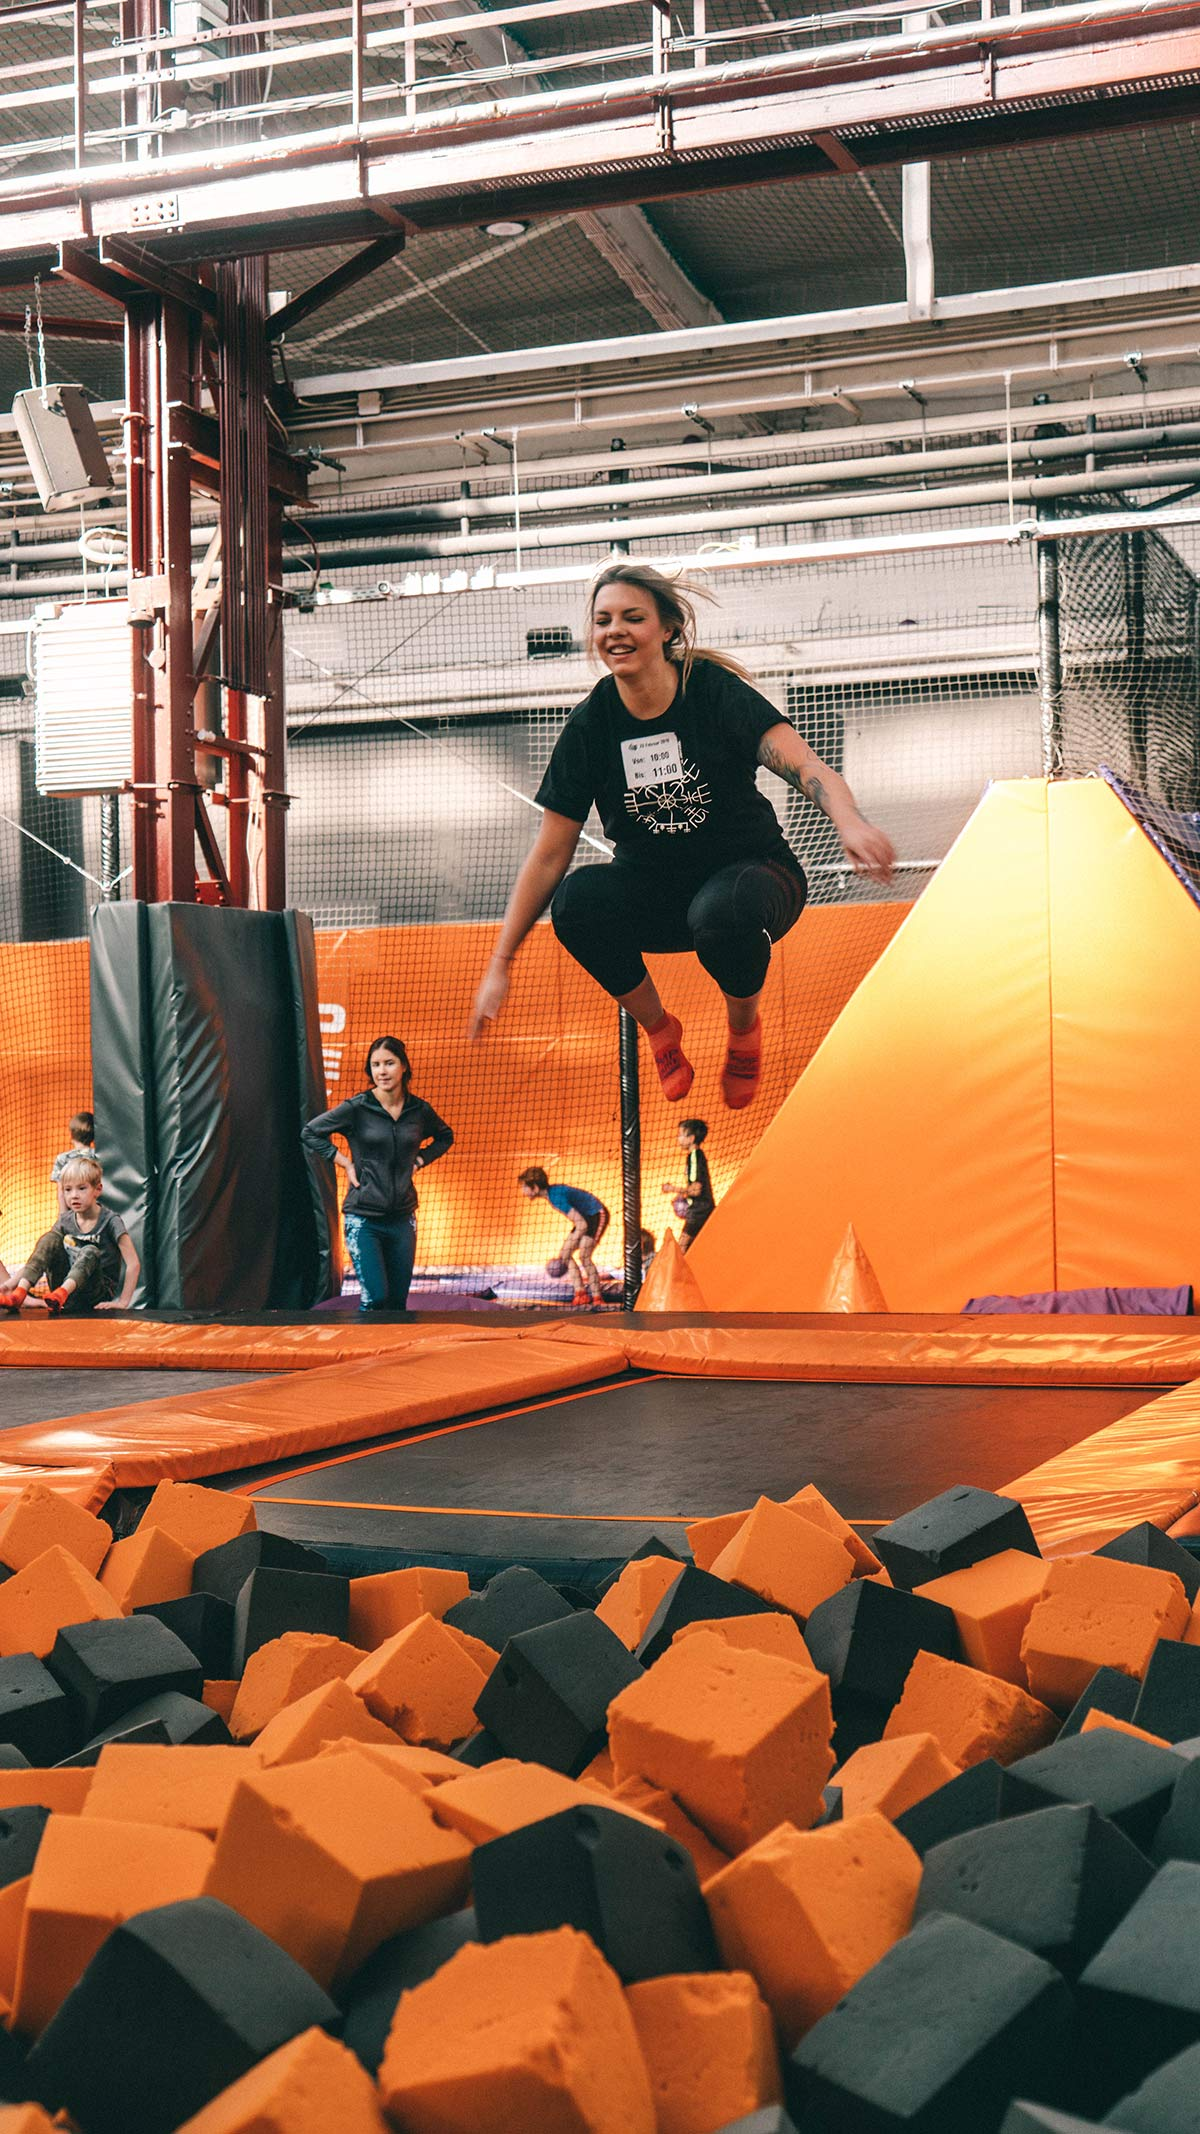 Springen im Jump House Berlin